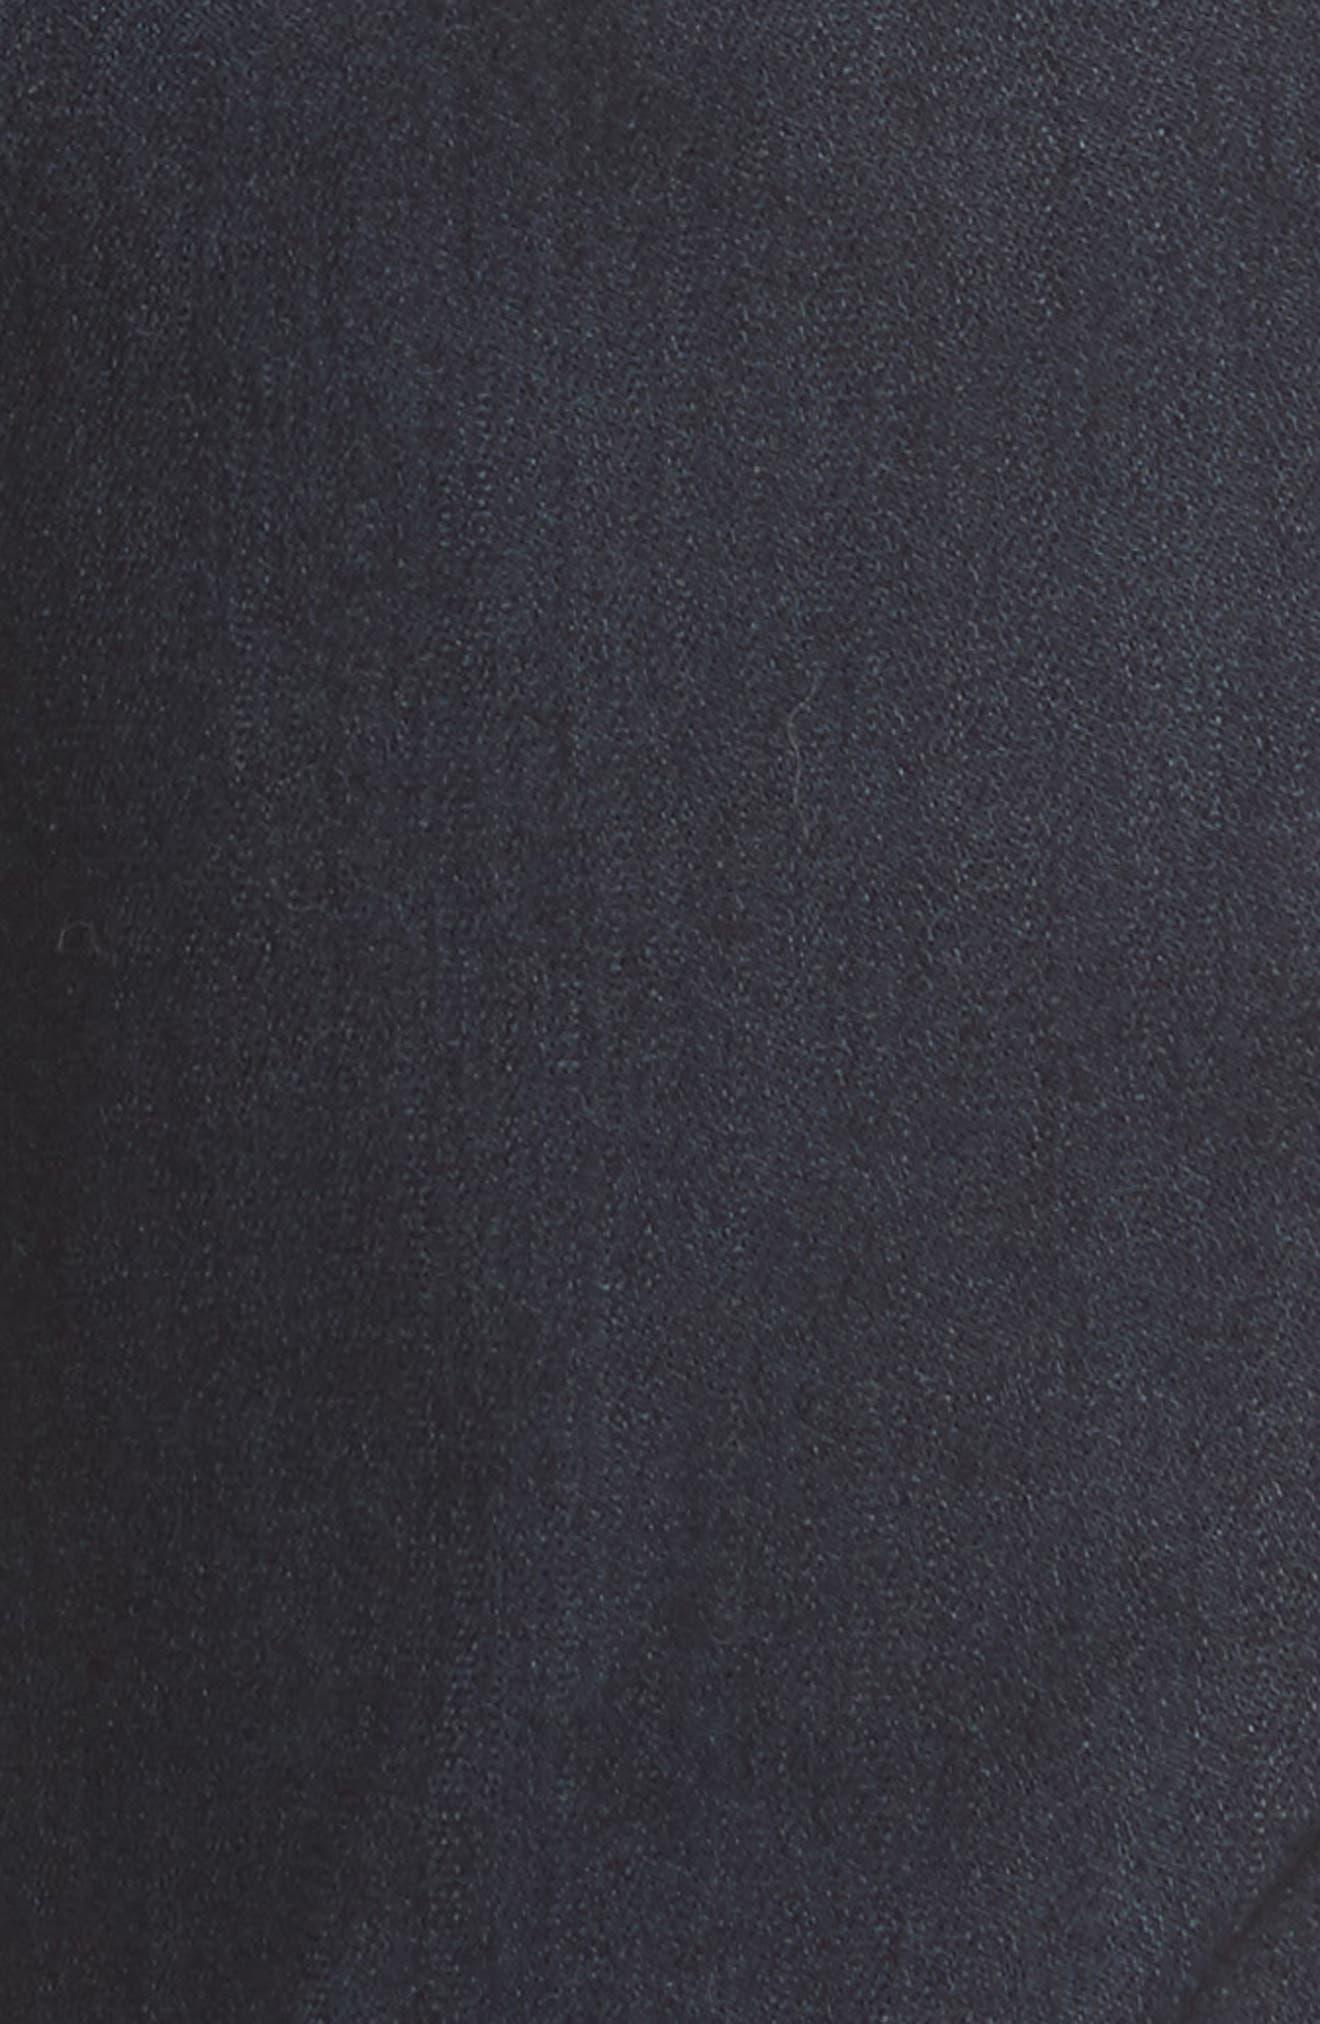 Transcend - Croft Skinny Fit Jeans,                             Alternate thumbnail 5, color,                             400